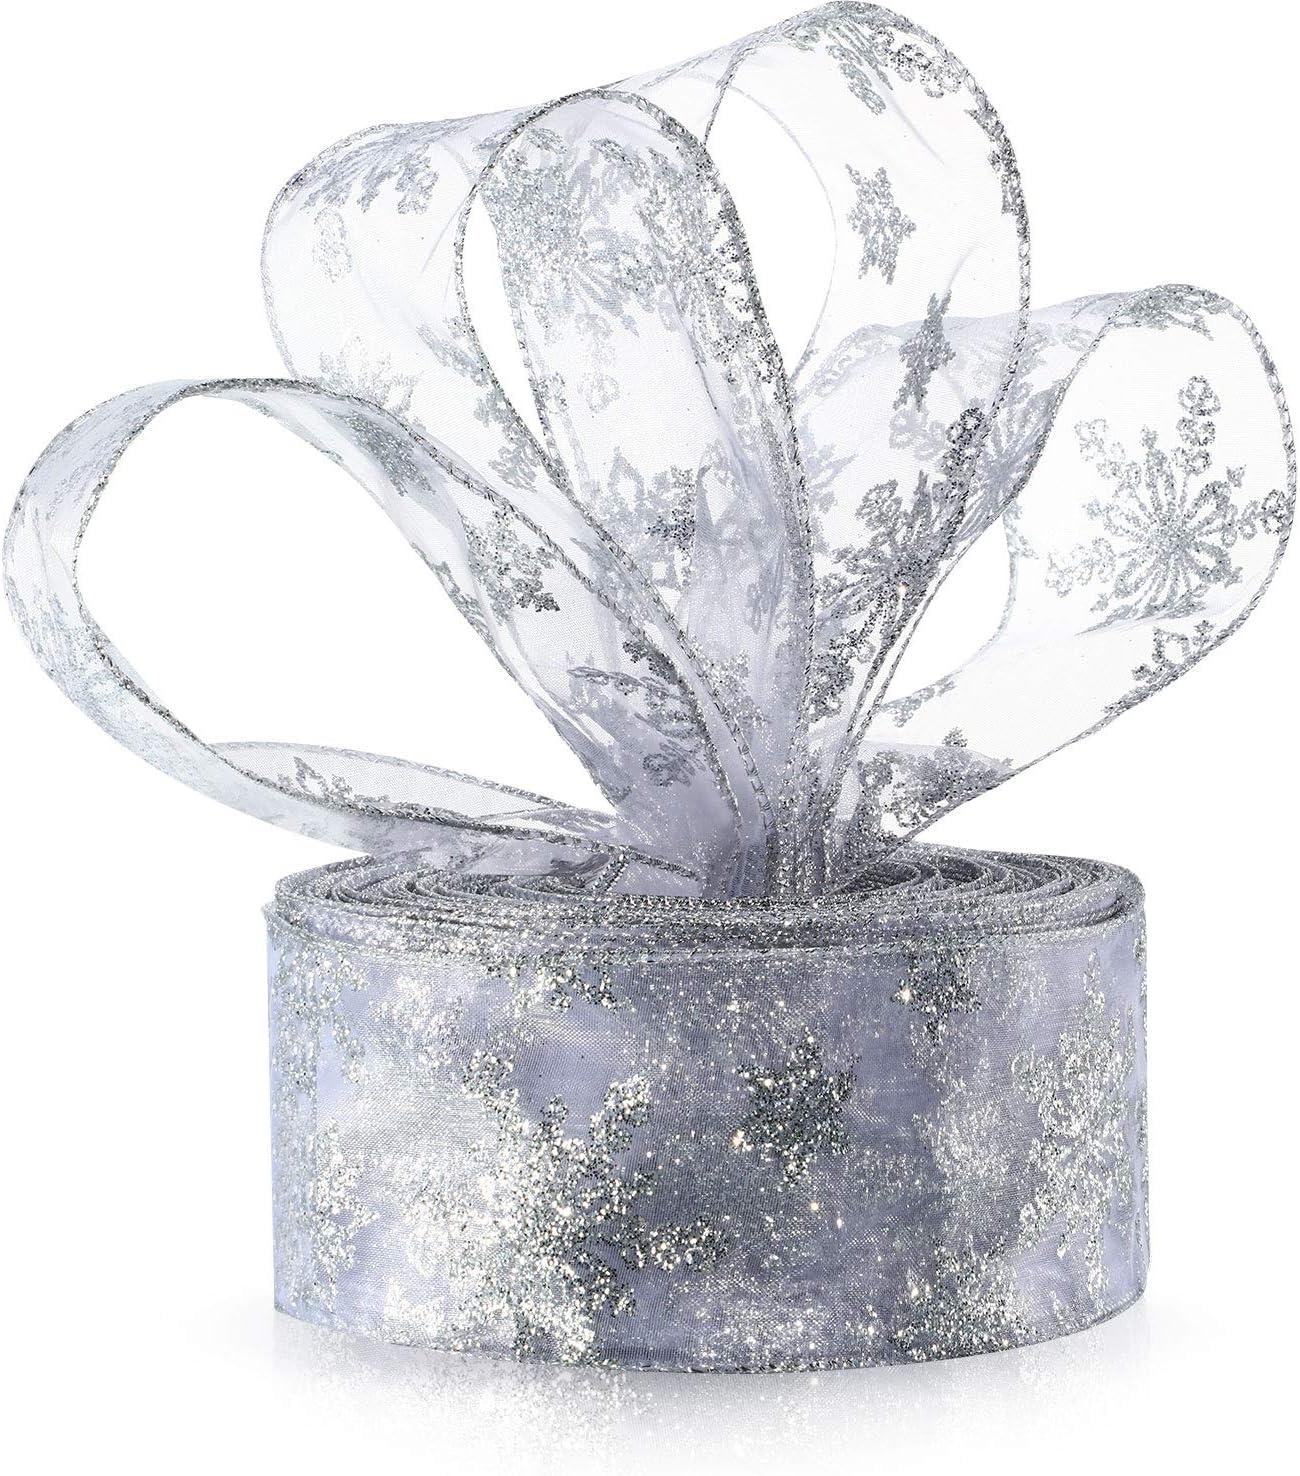 10M Christmas Snowflake Organza Stain Ribbon Party Gift Wrapping Wedding Decor